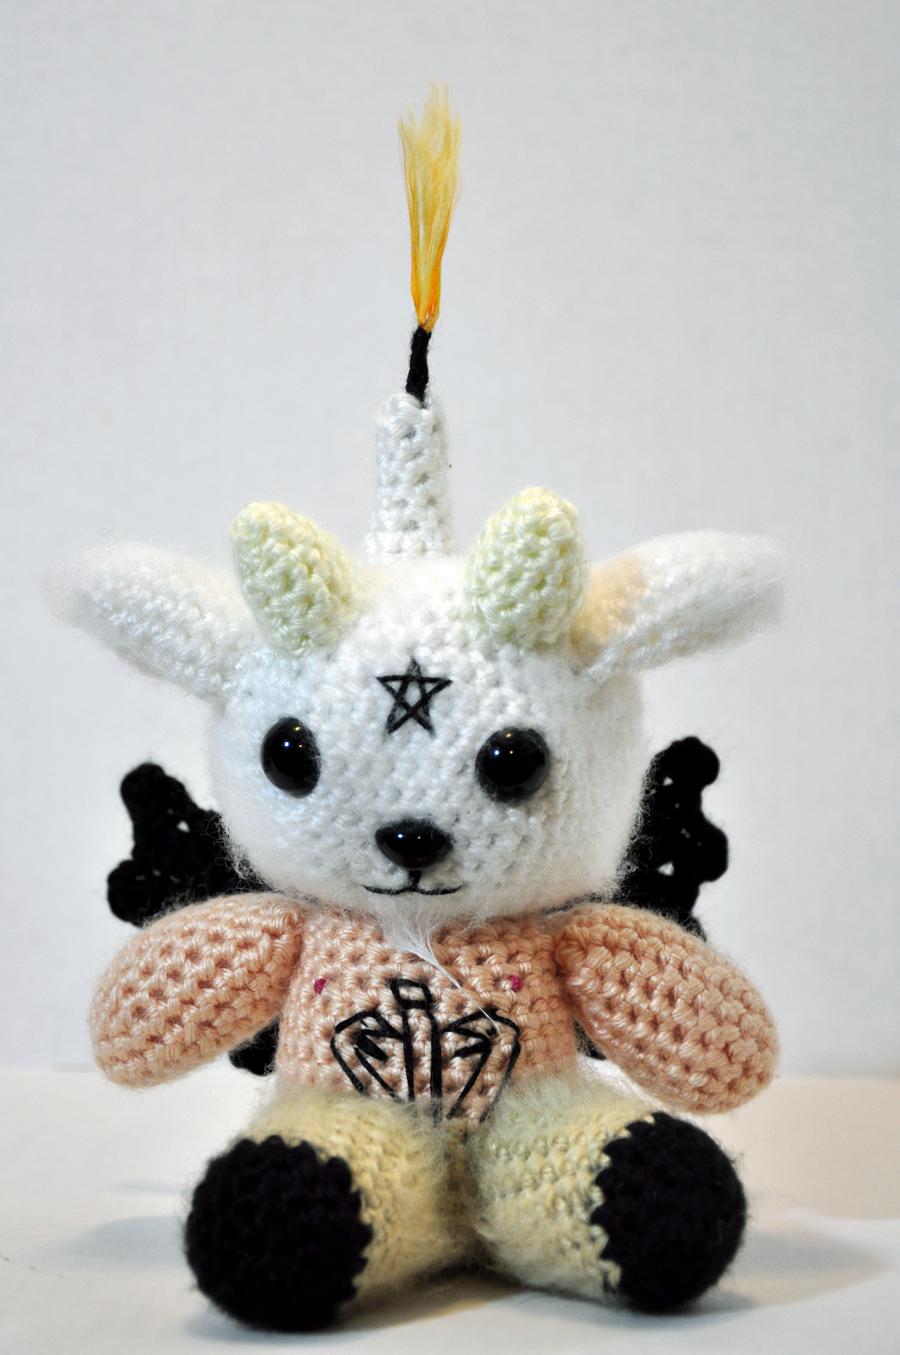 He Crocheted a Baby Baphomet Amigurumi